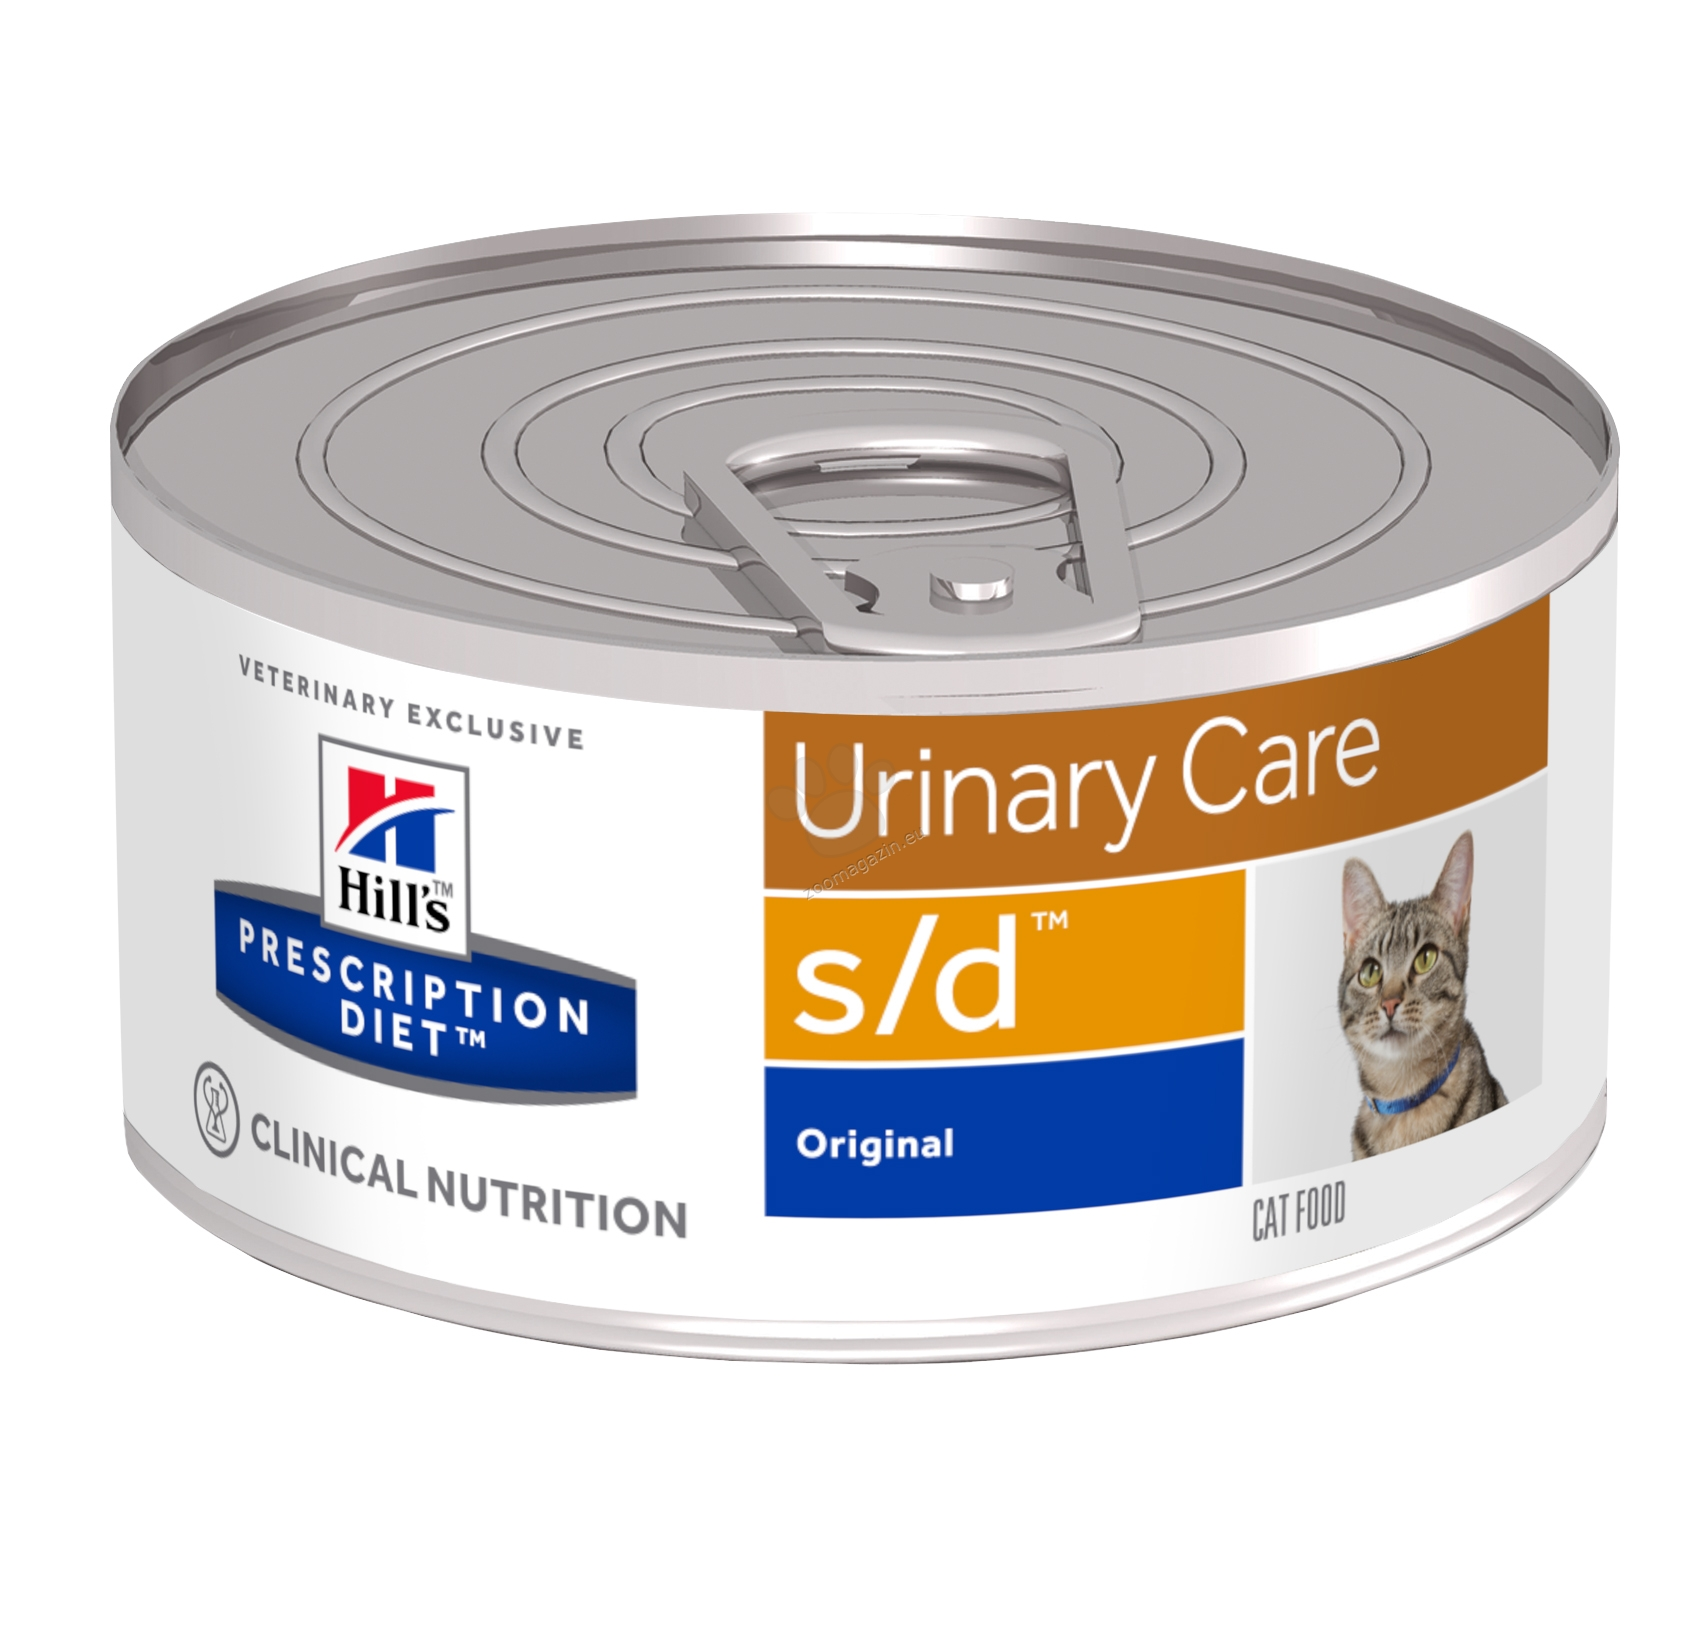 Hills Prescription Diet s/d Feline – за бързо разтваряне на струвитни уролити (до 7 дни) 156 гр.